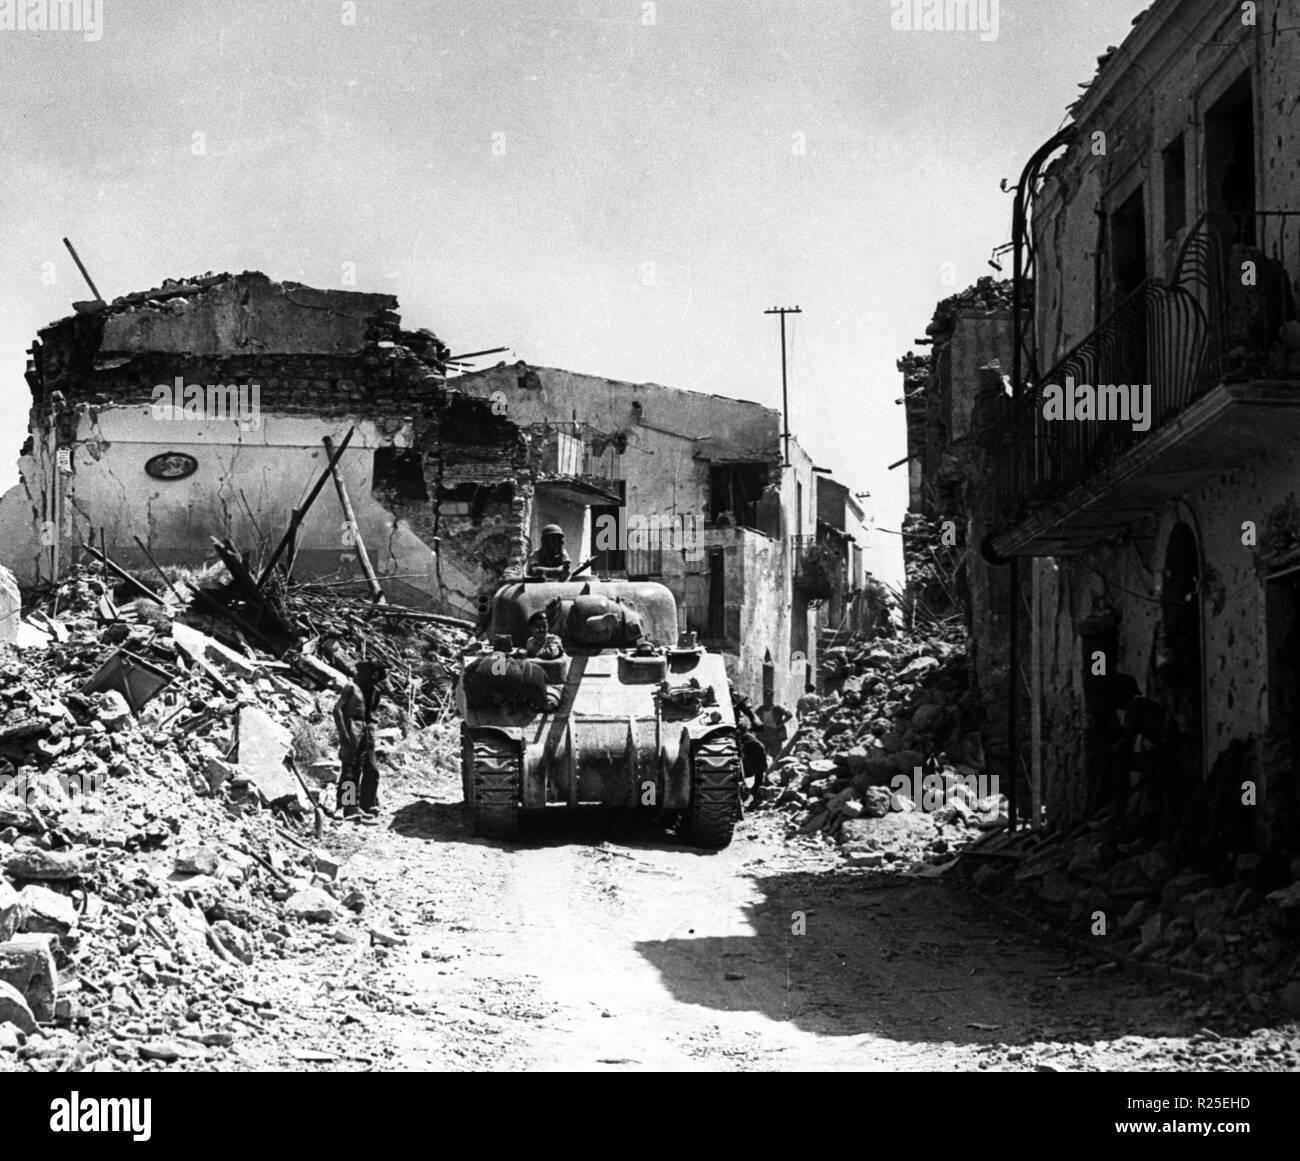 Panzer Sherman III der Kanadischen Arme nach der Invasion und bei der Befreiung Sizilien 1943 - Tank Sherman III of the Candian Army after the invasion and liberation of Sicily 1943 Stock Photo